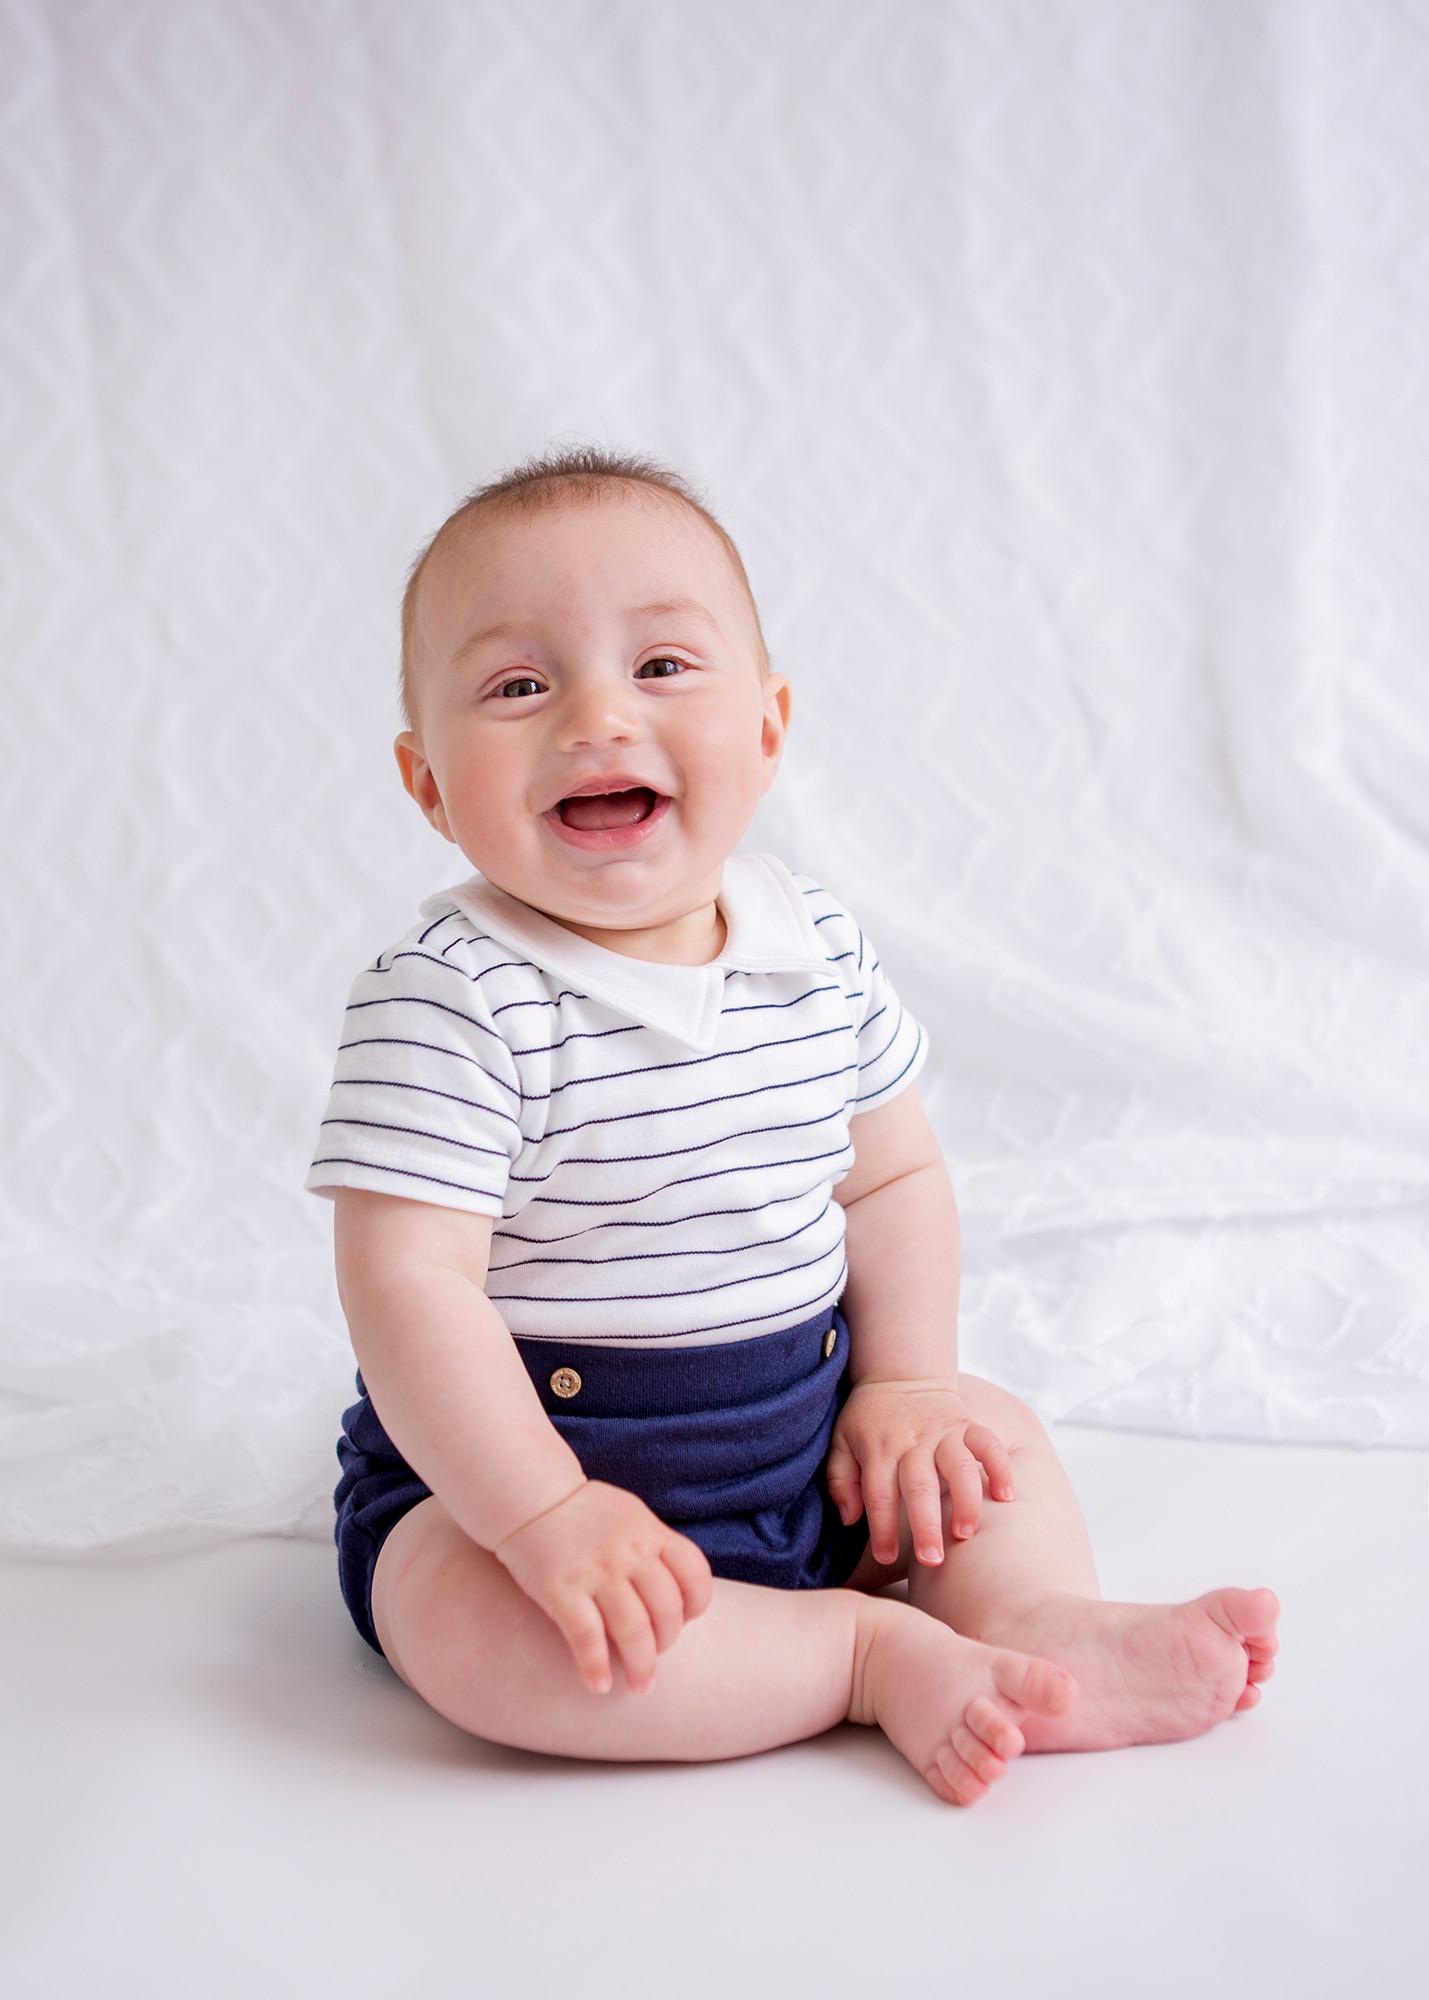 Baby/Preschool Taster Portrait Sessions